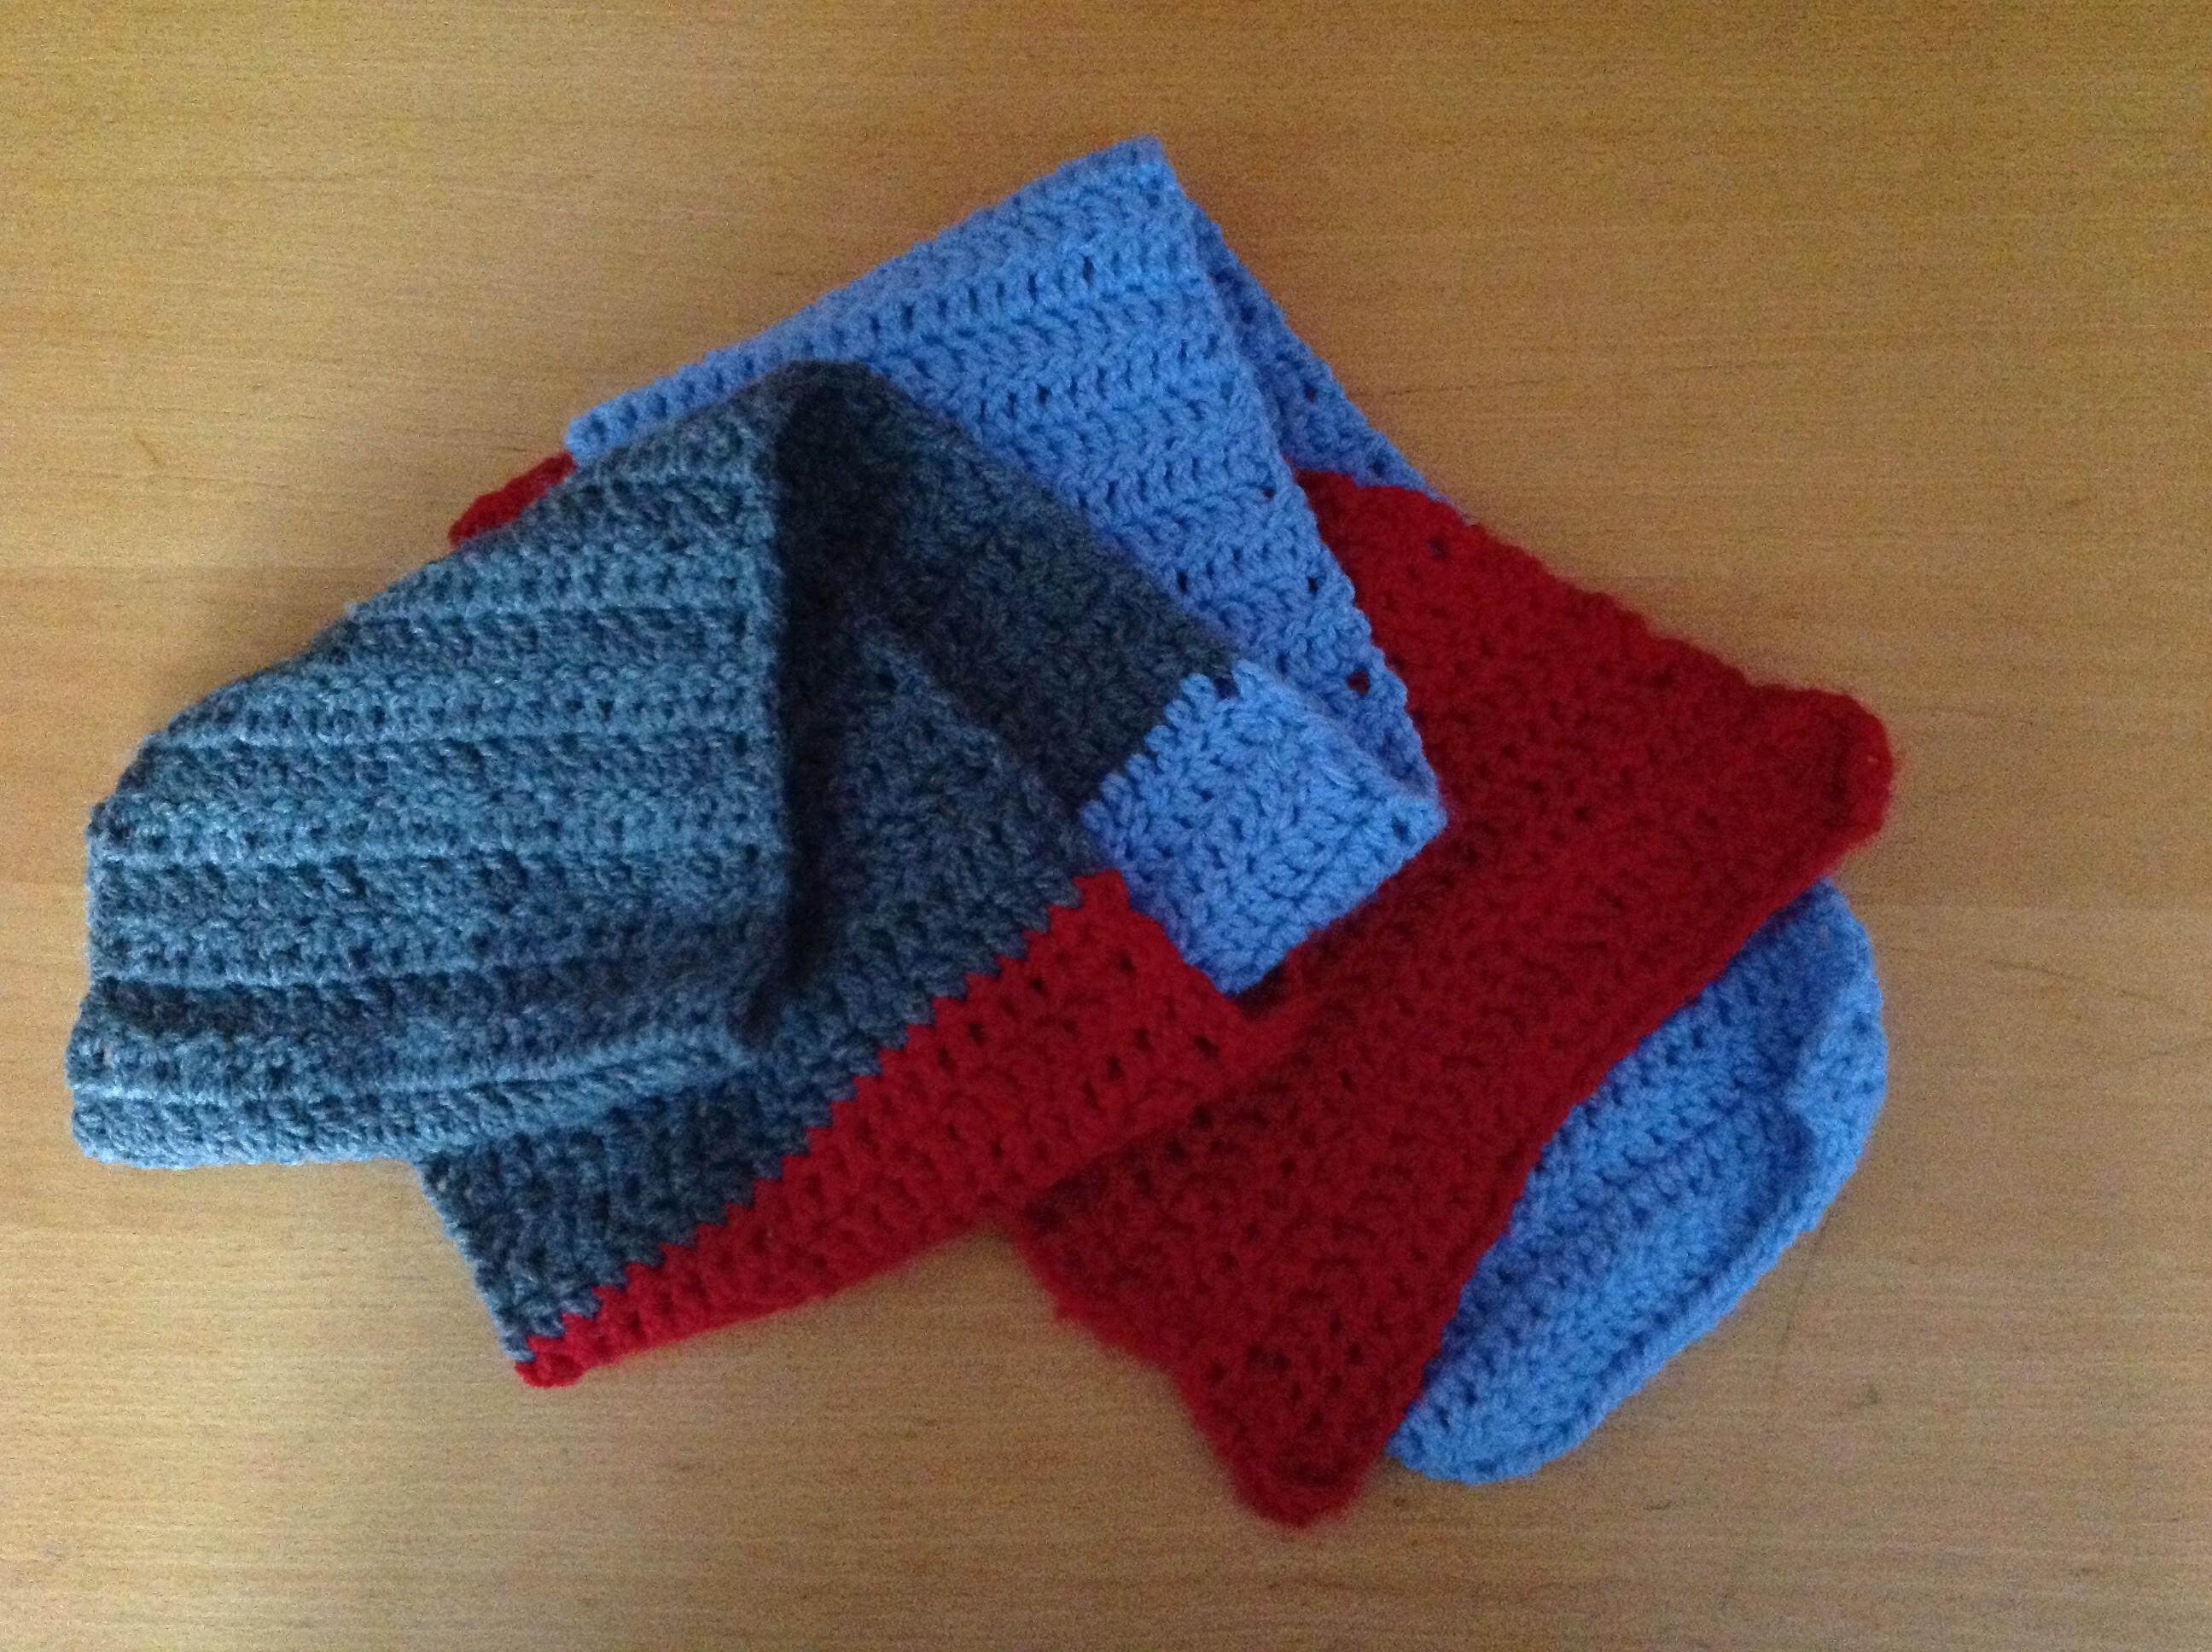 Crochet Project: Scarf